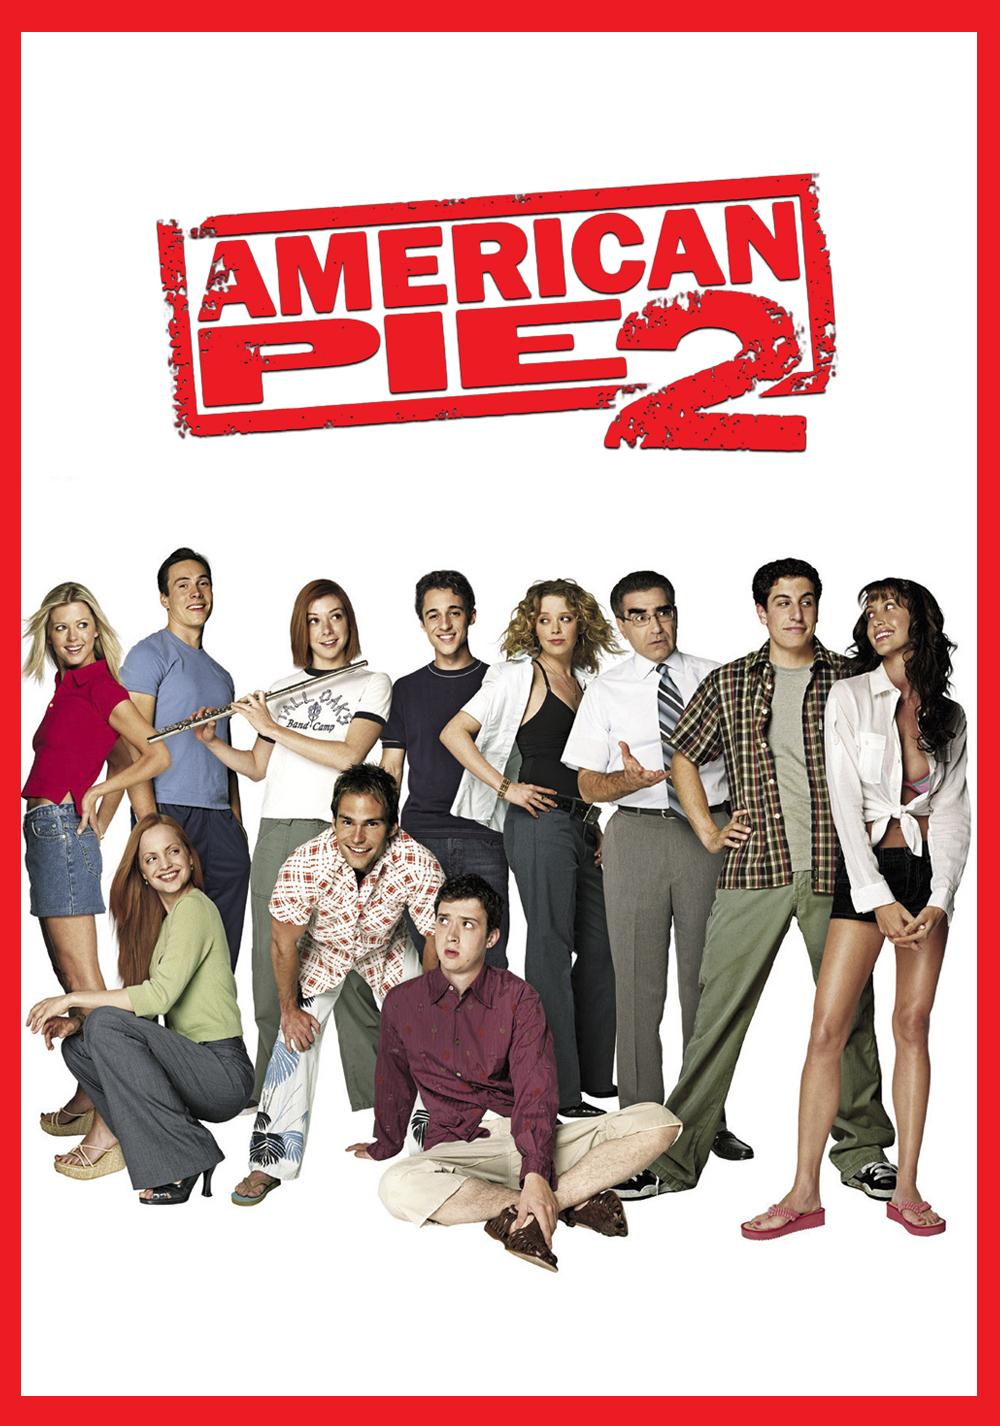 American Pie - IMDb